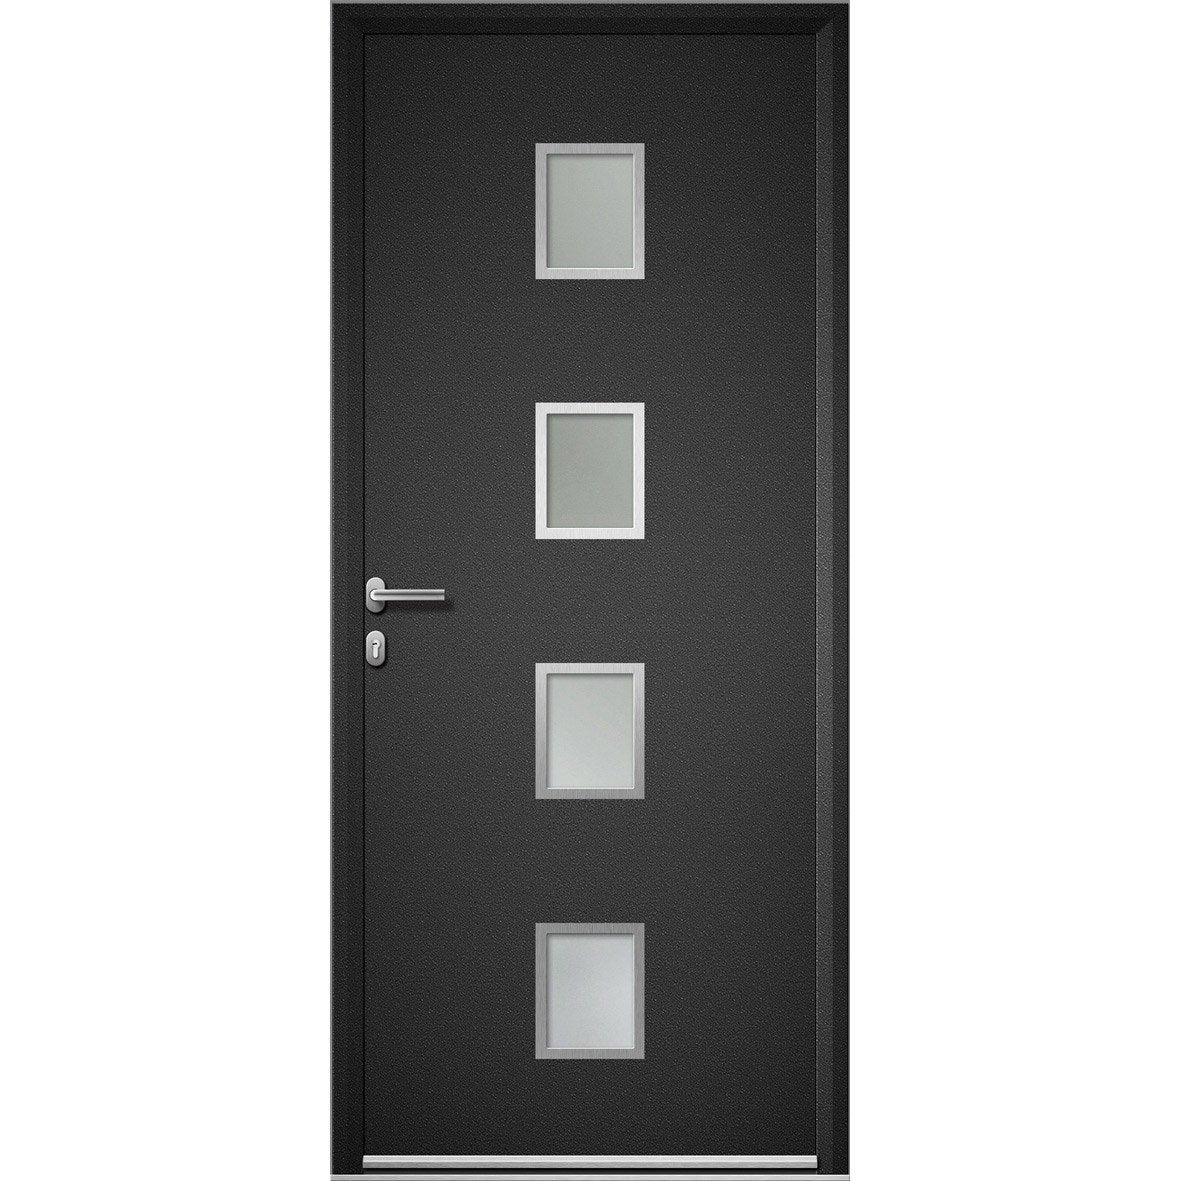 Leroy merlin porte entree alu maison design - Porte aluminium leroy merlin ...